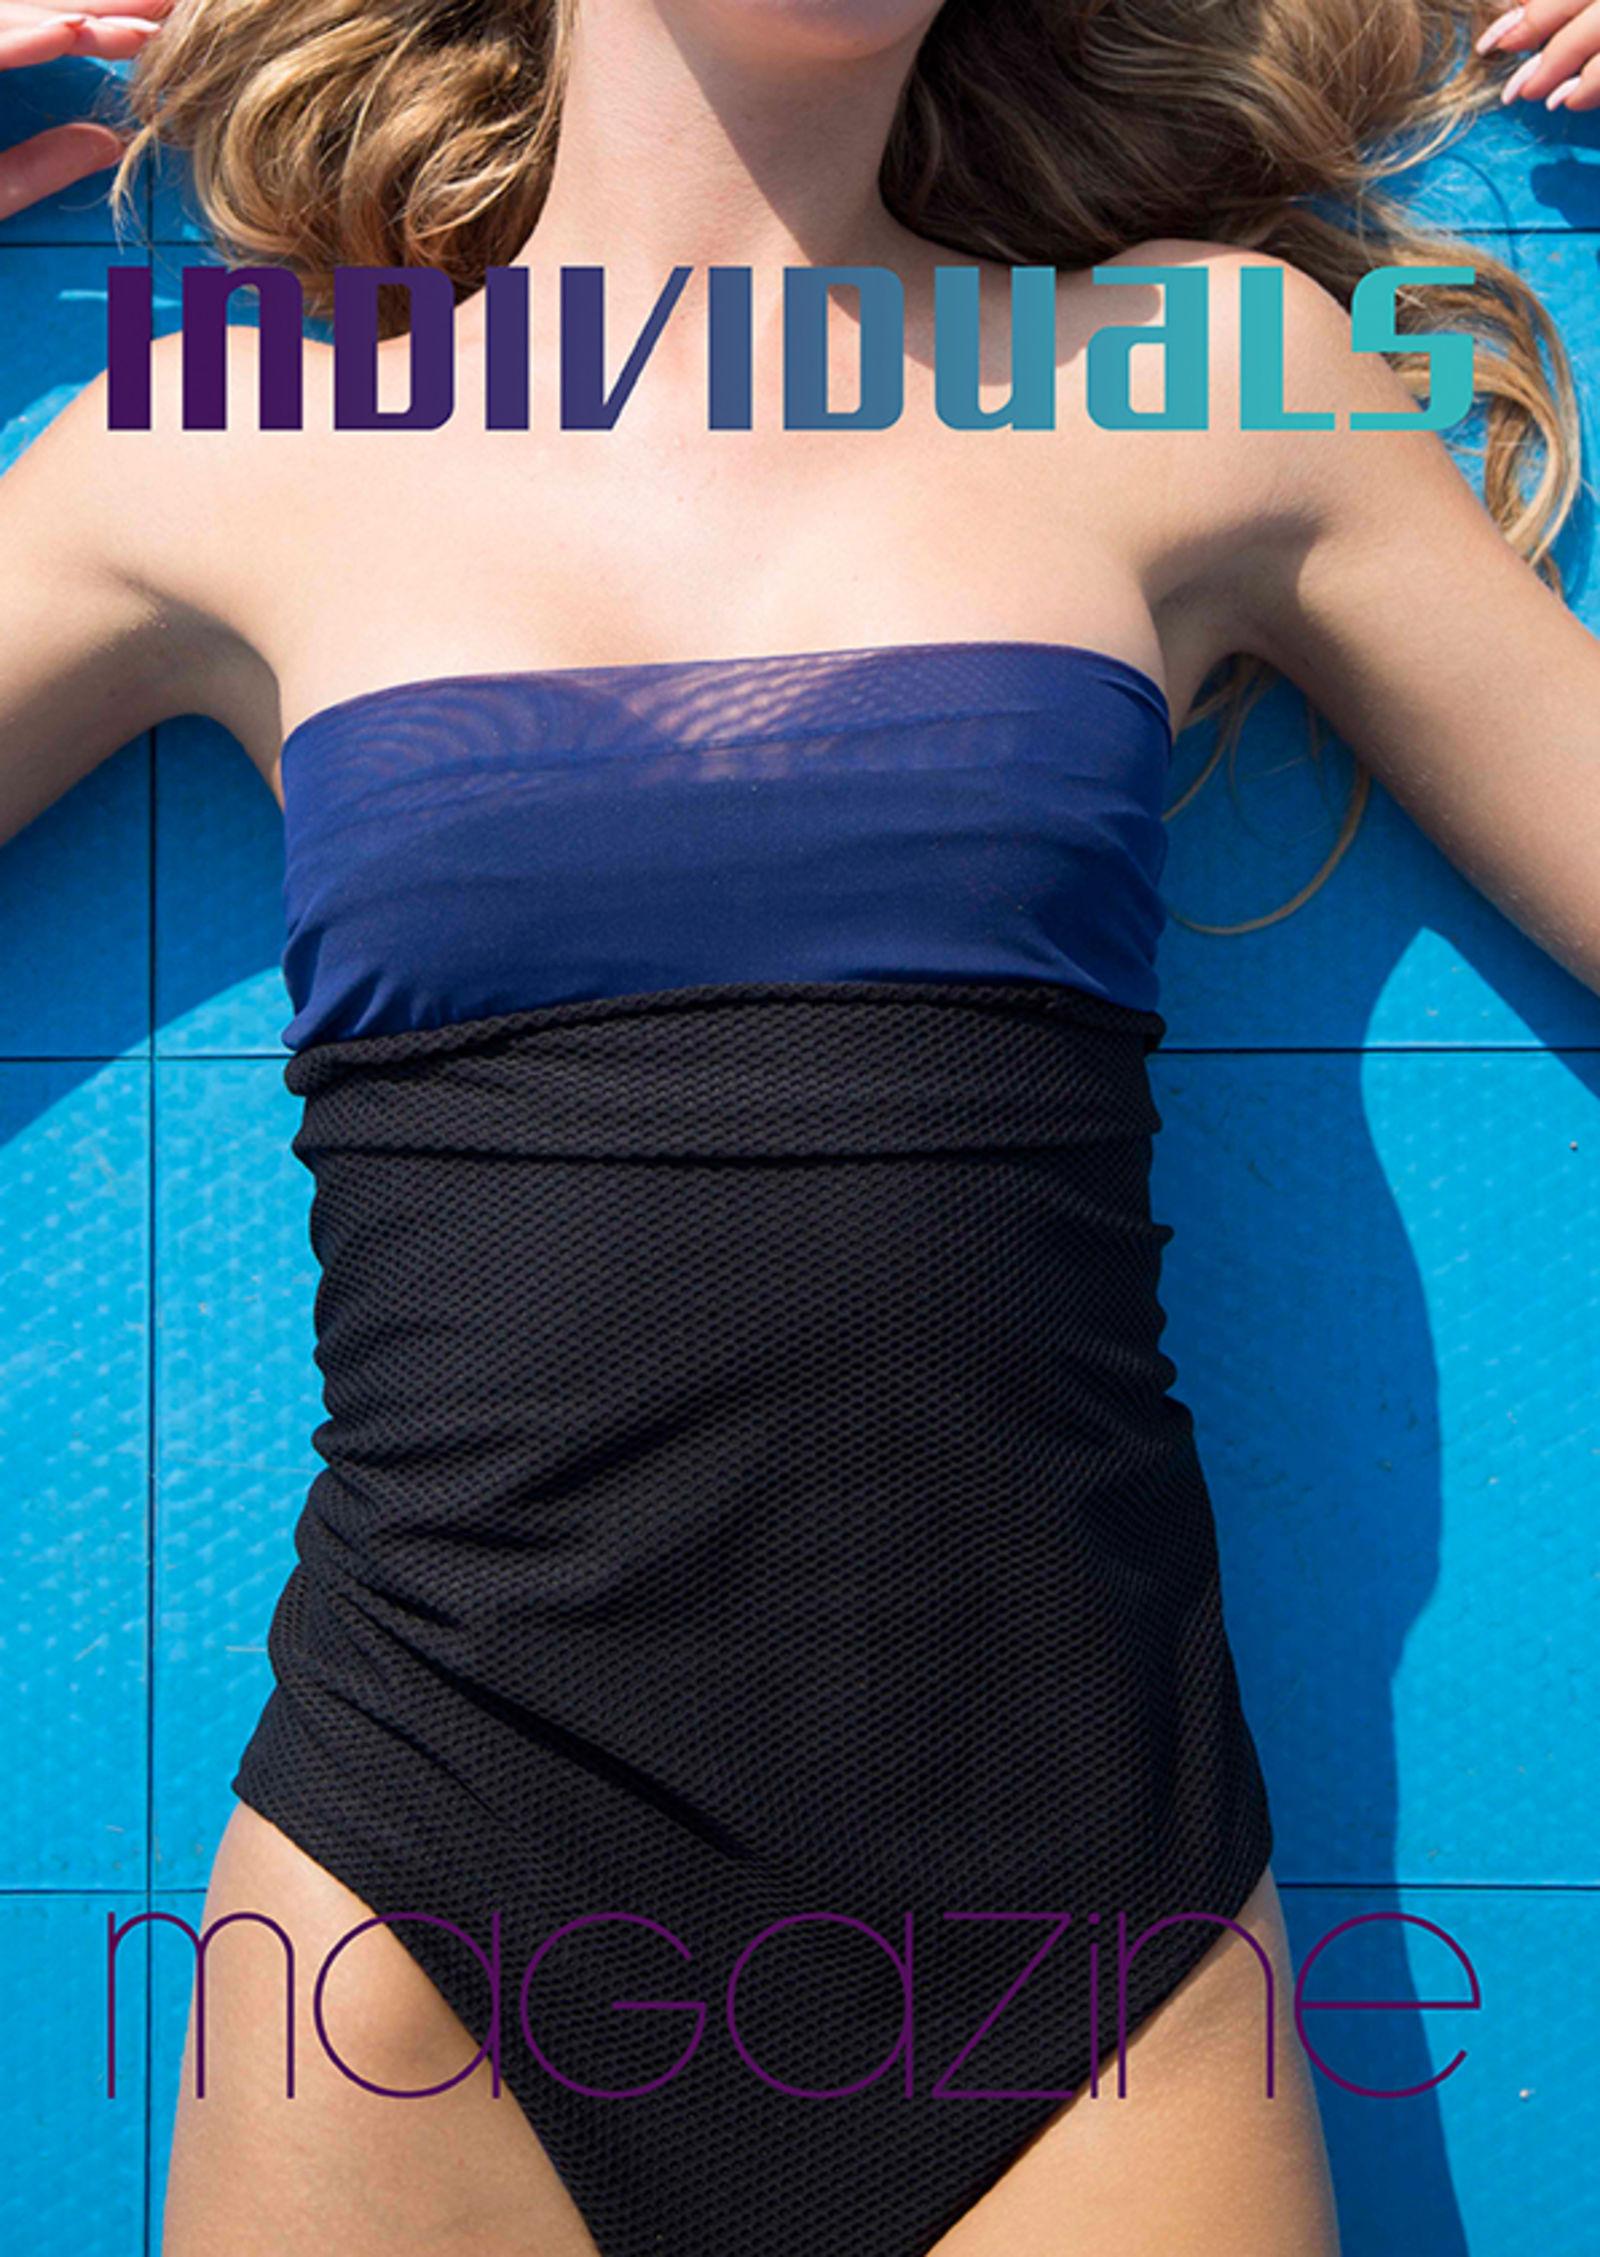 INDIVIDUALS (Image 1)